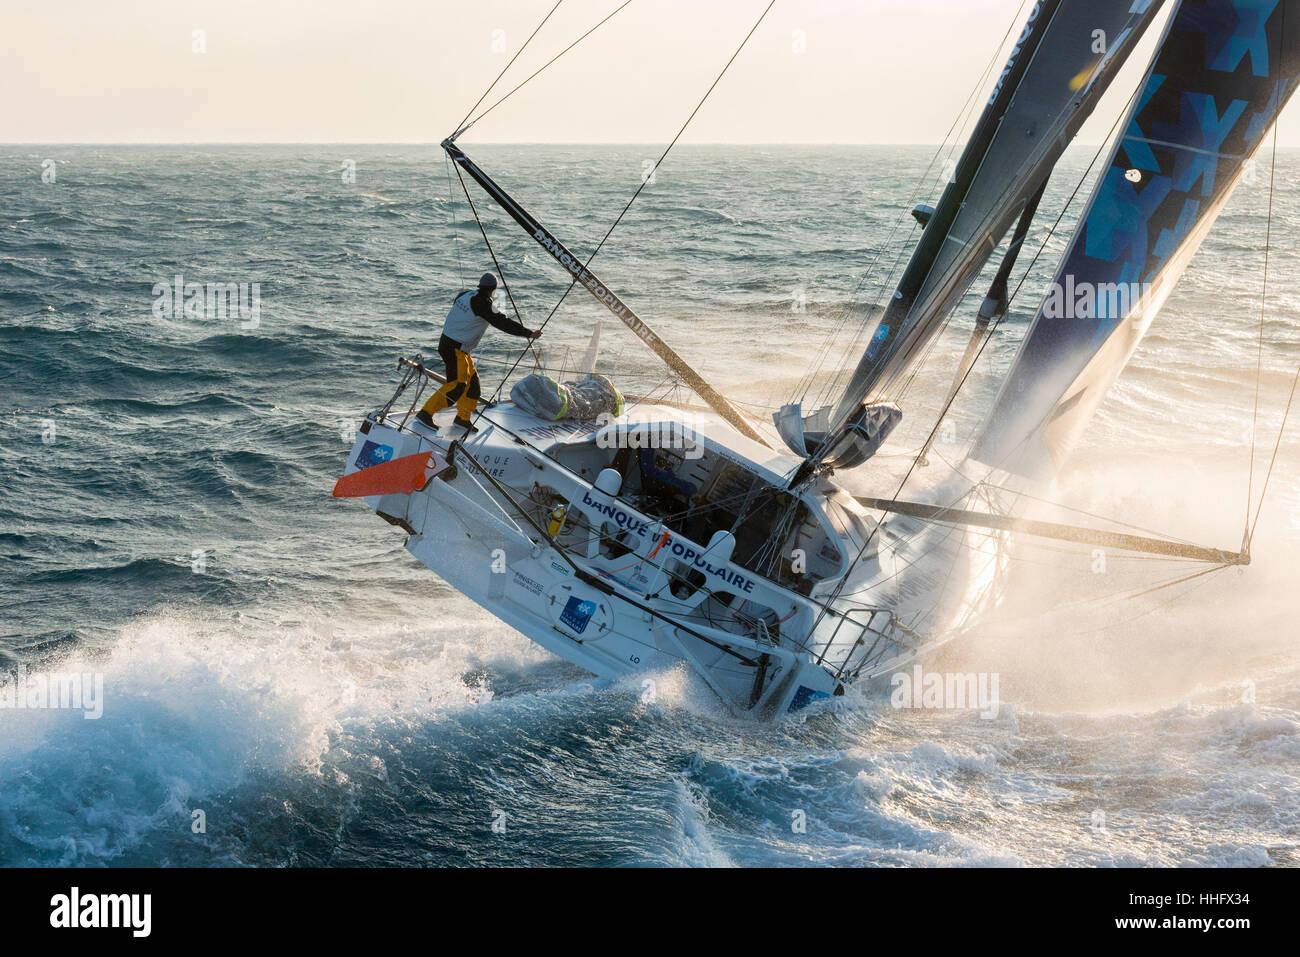 Yacht Race Vendée Globe 2017: Armel Le Cléac'h a bordo della Banque Populaire VIII monohull vela (2017/01/19) Foto Stock